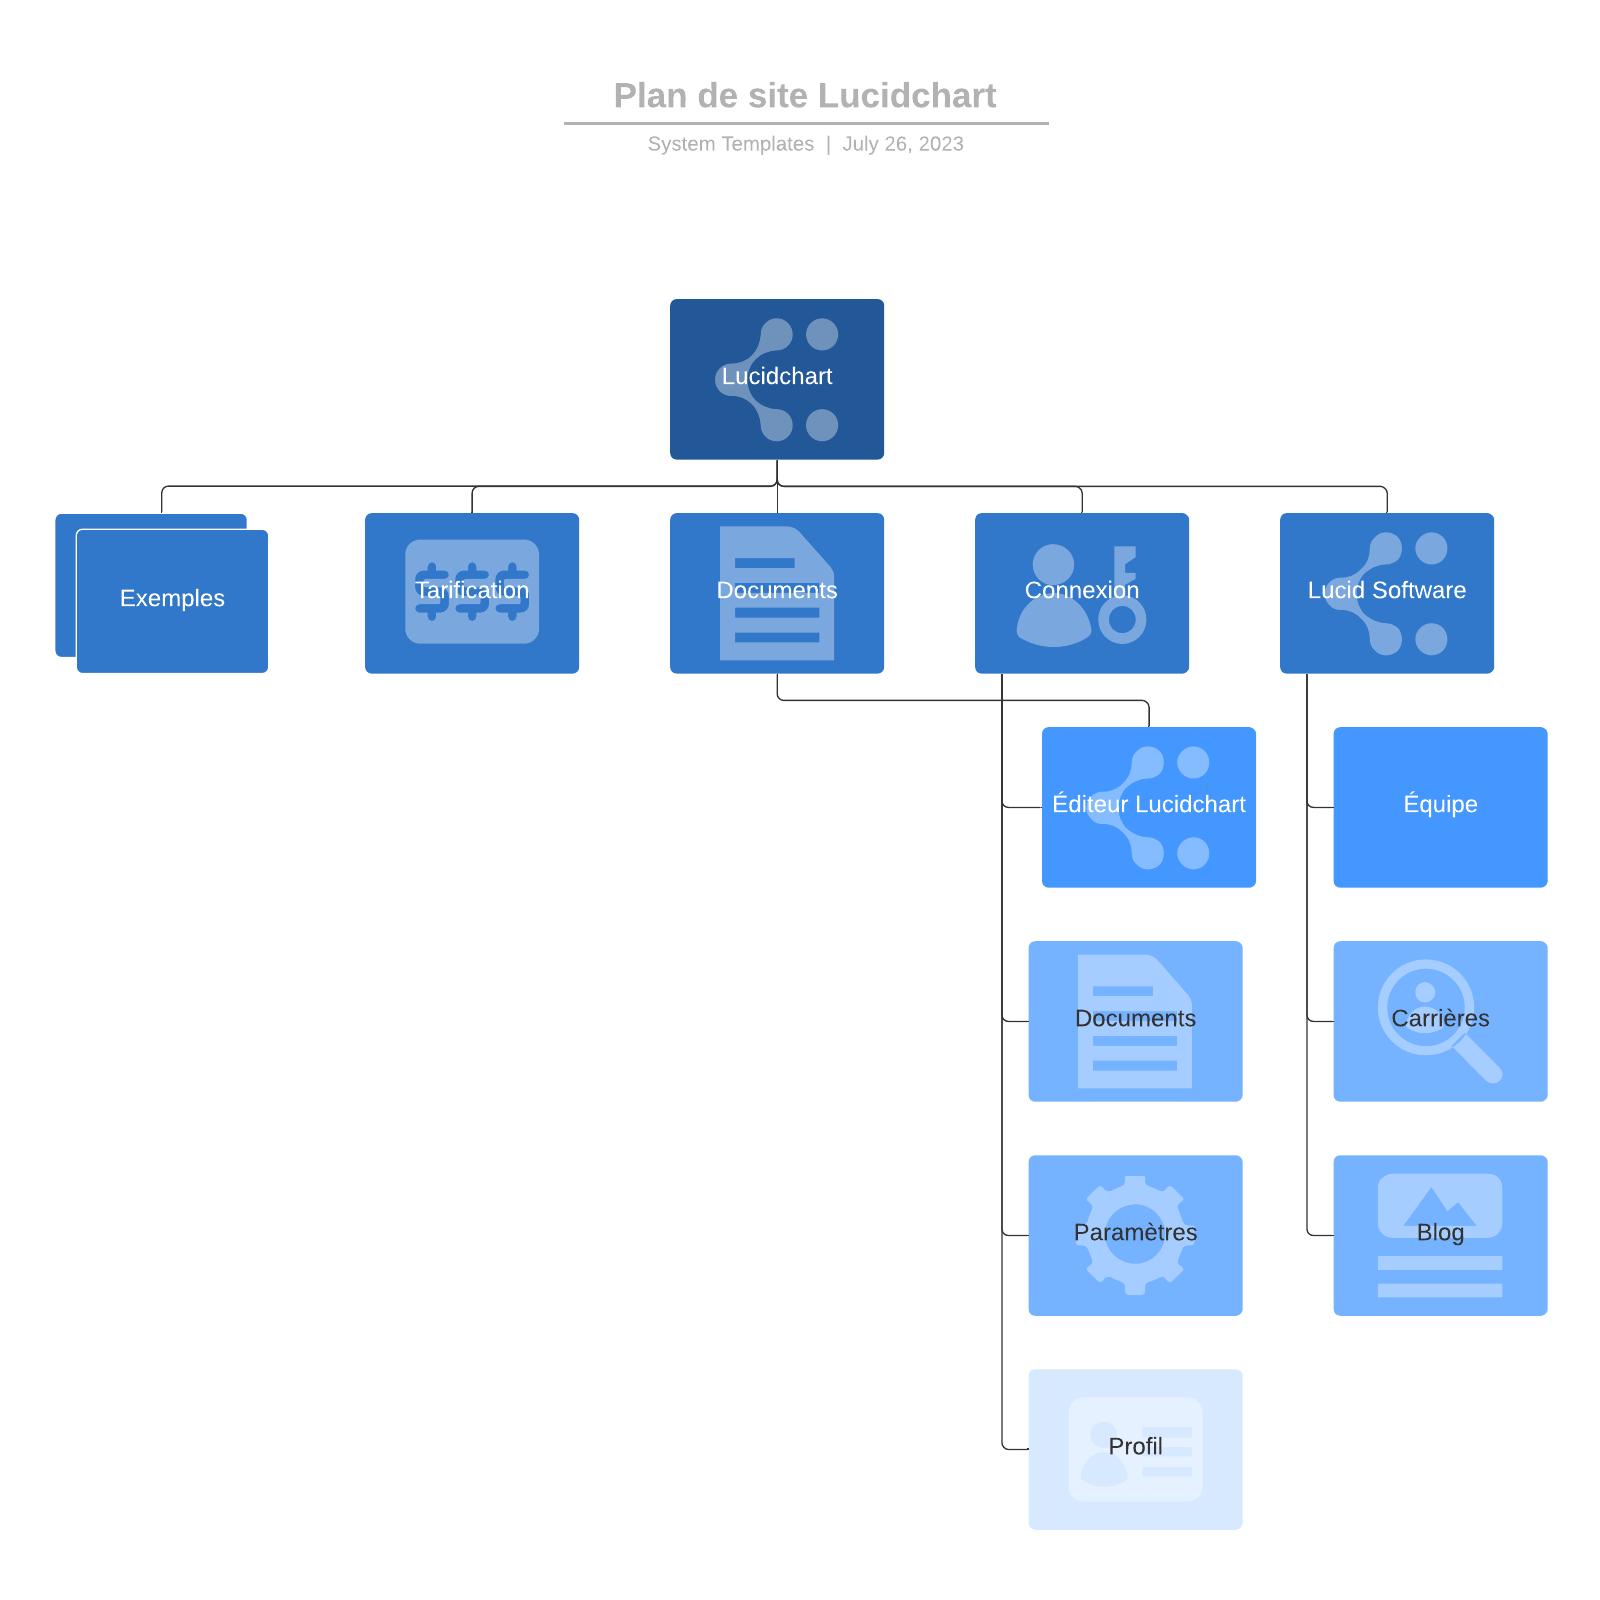 exemple de plan de site Lucidchart